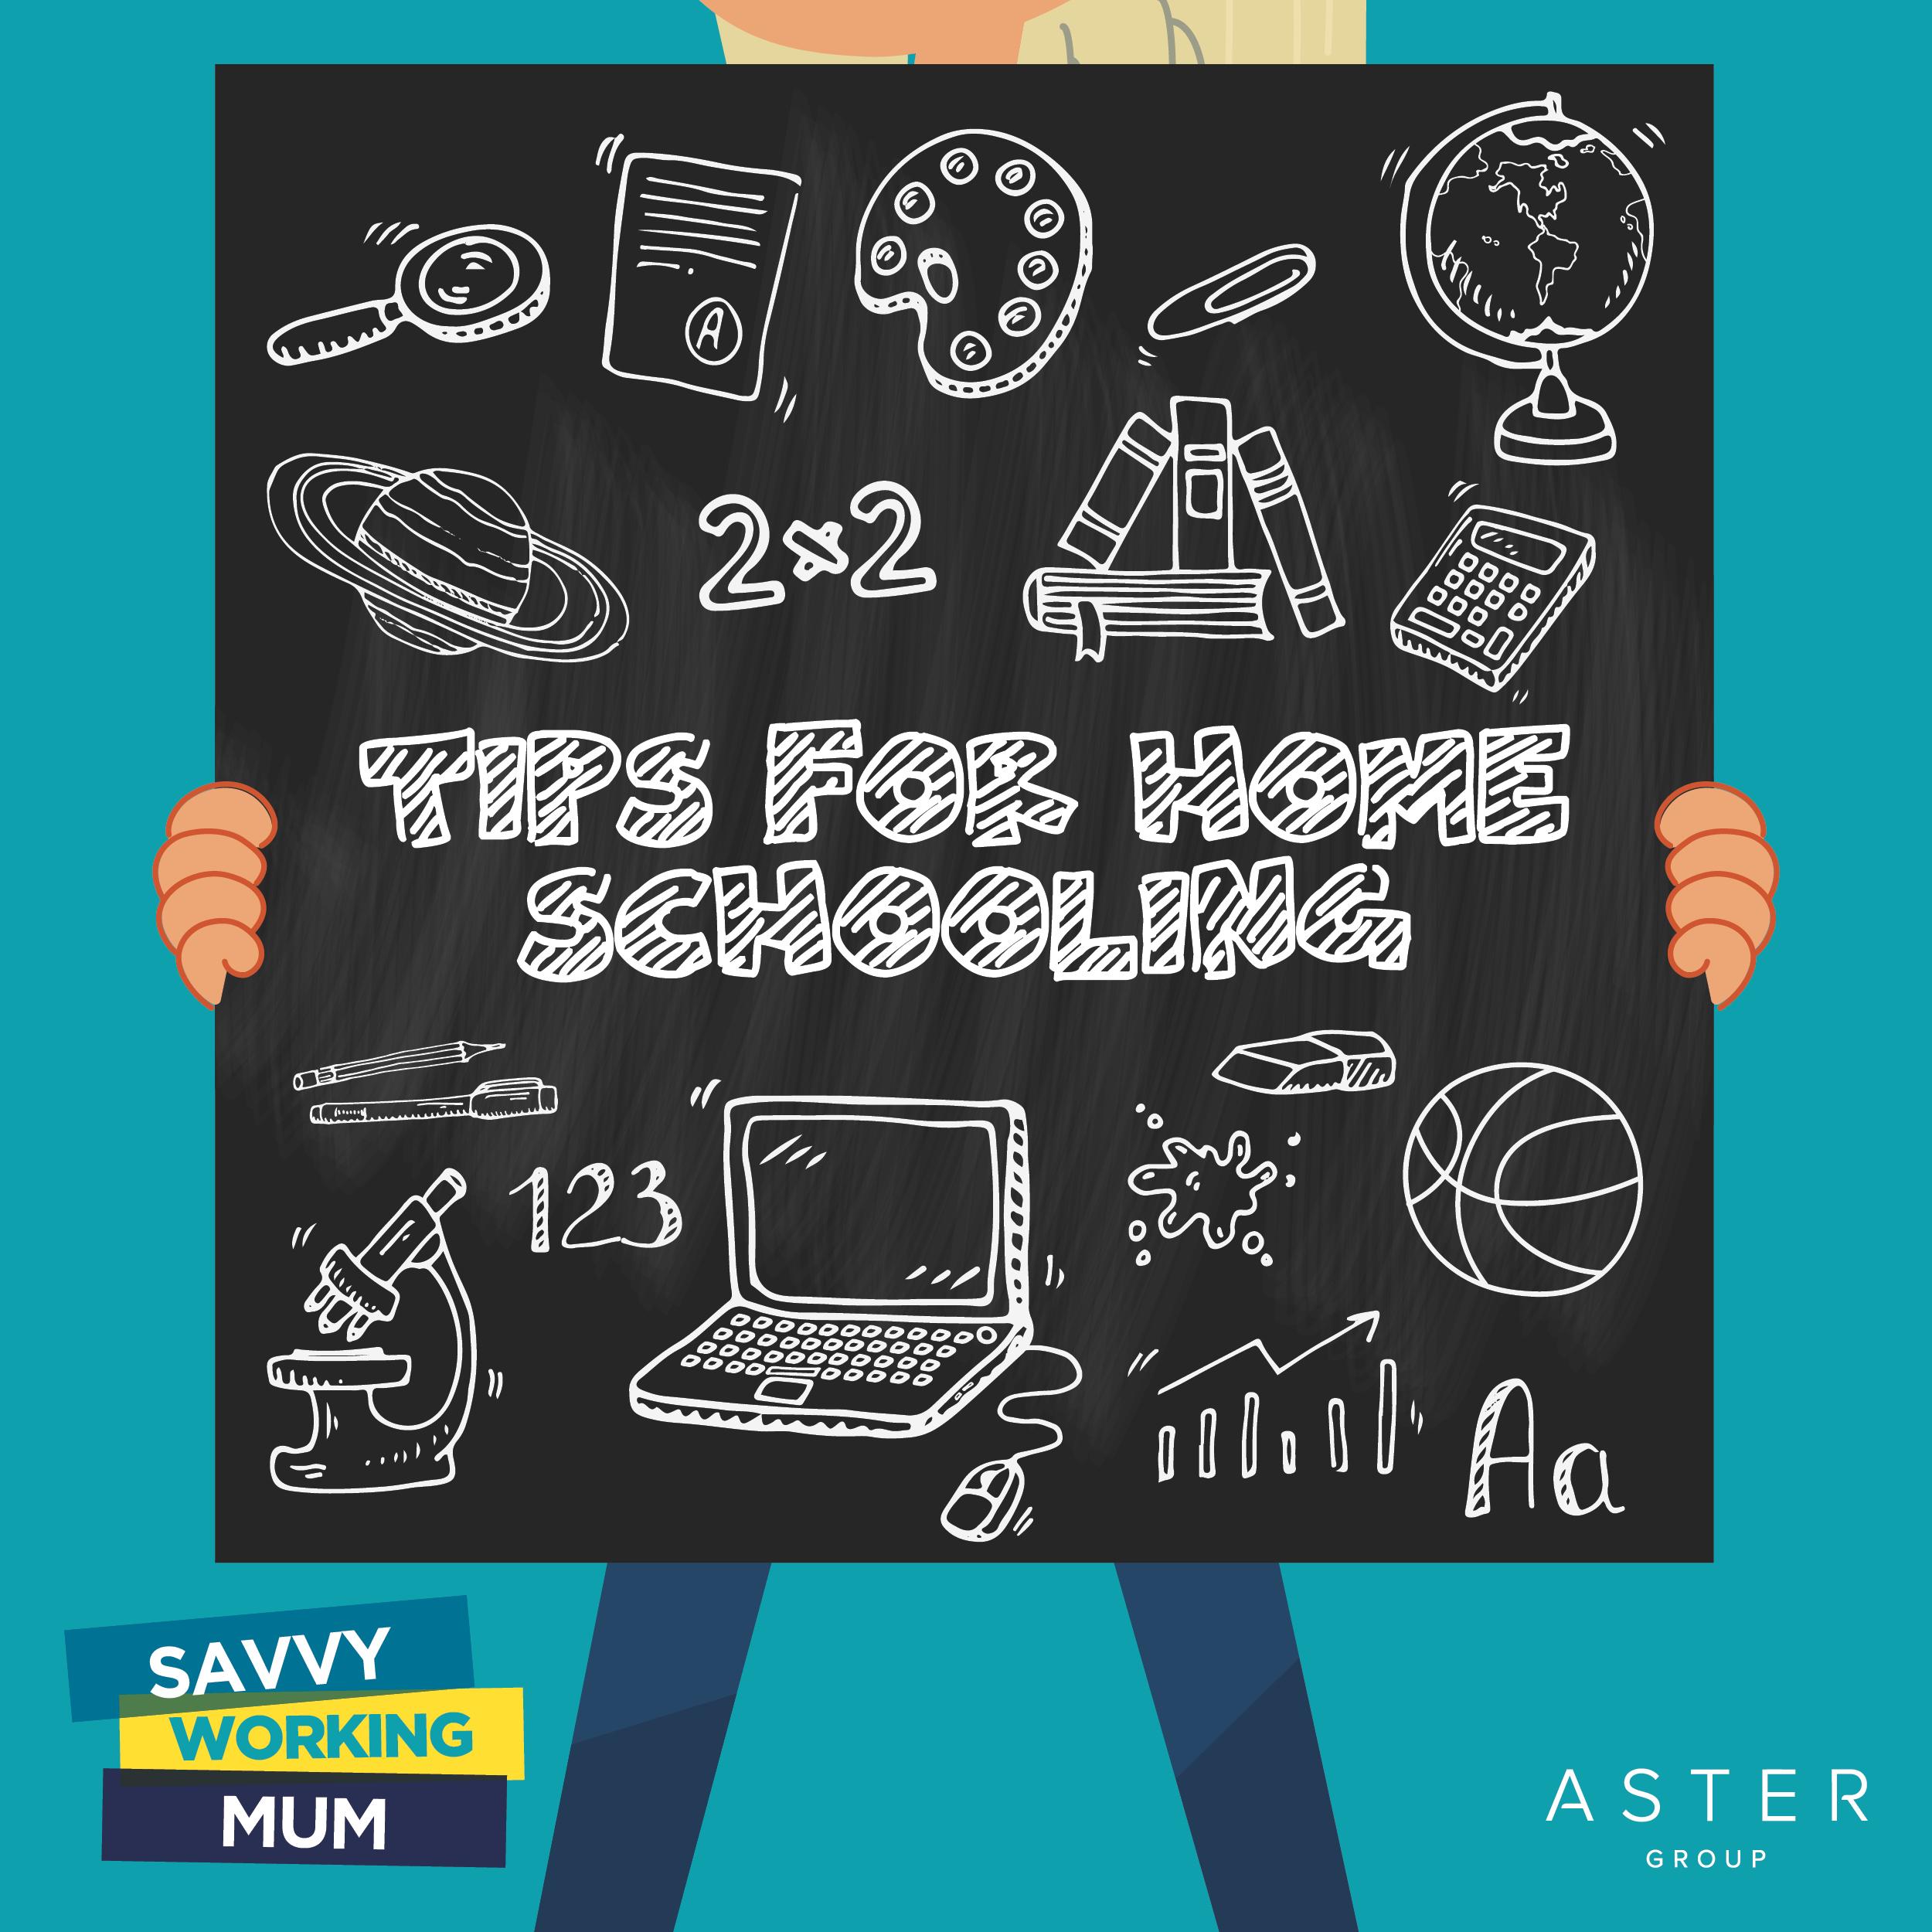 Home-School Novice - 'How you doin'?'